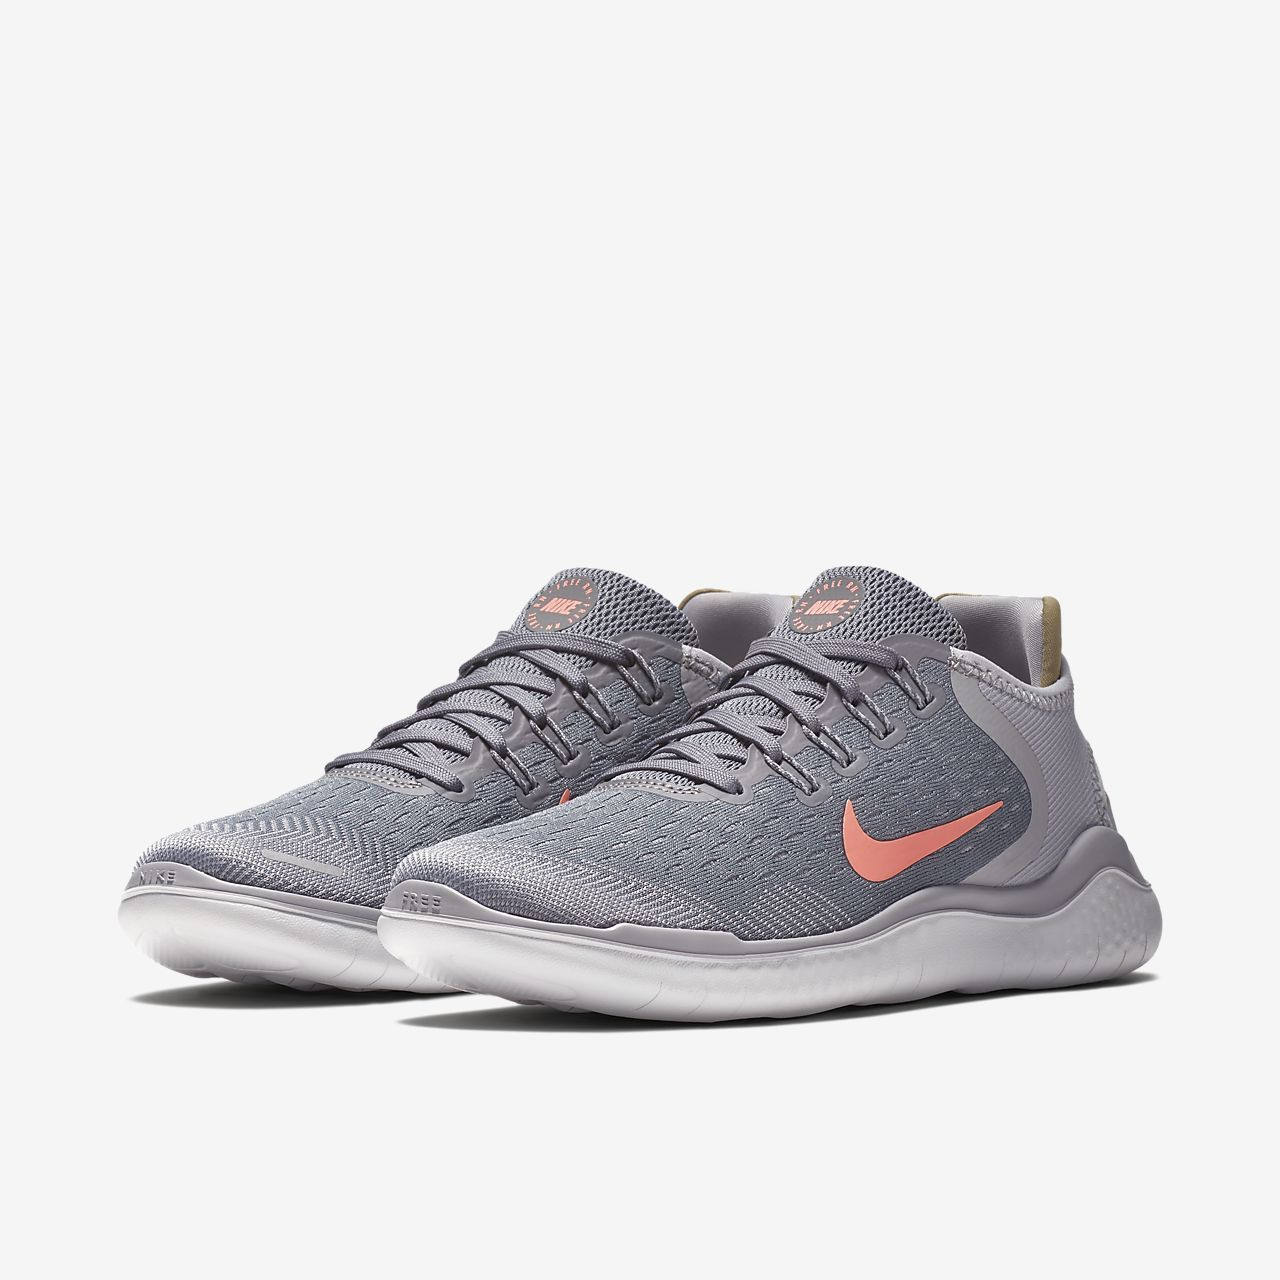 Free Rn 2018 Women S Running Shoe Nike Running Shoes Women Running Shoes Nike Free Nike Shoes Women